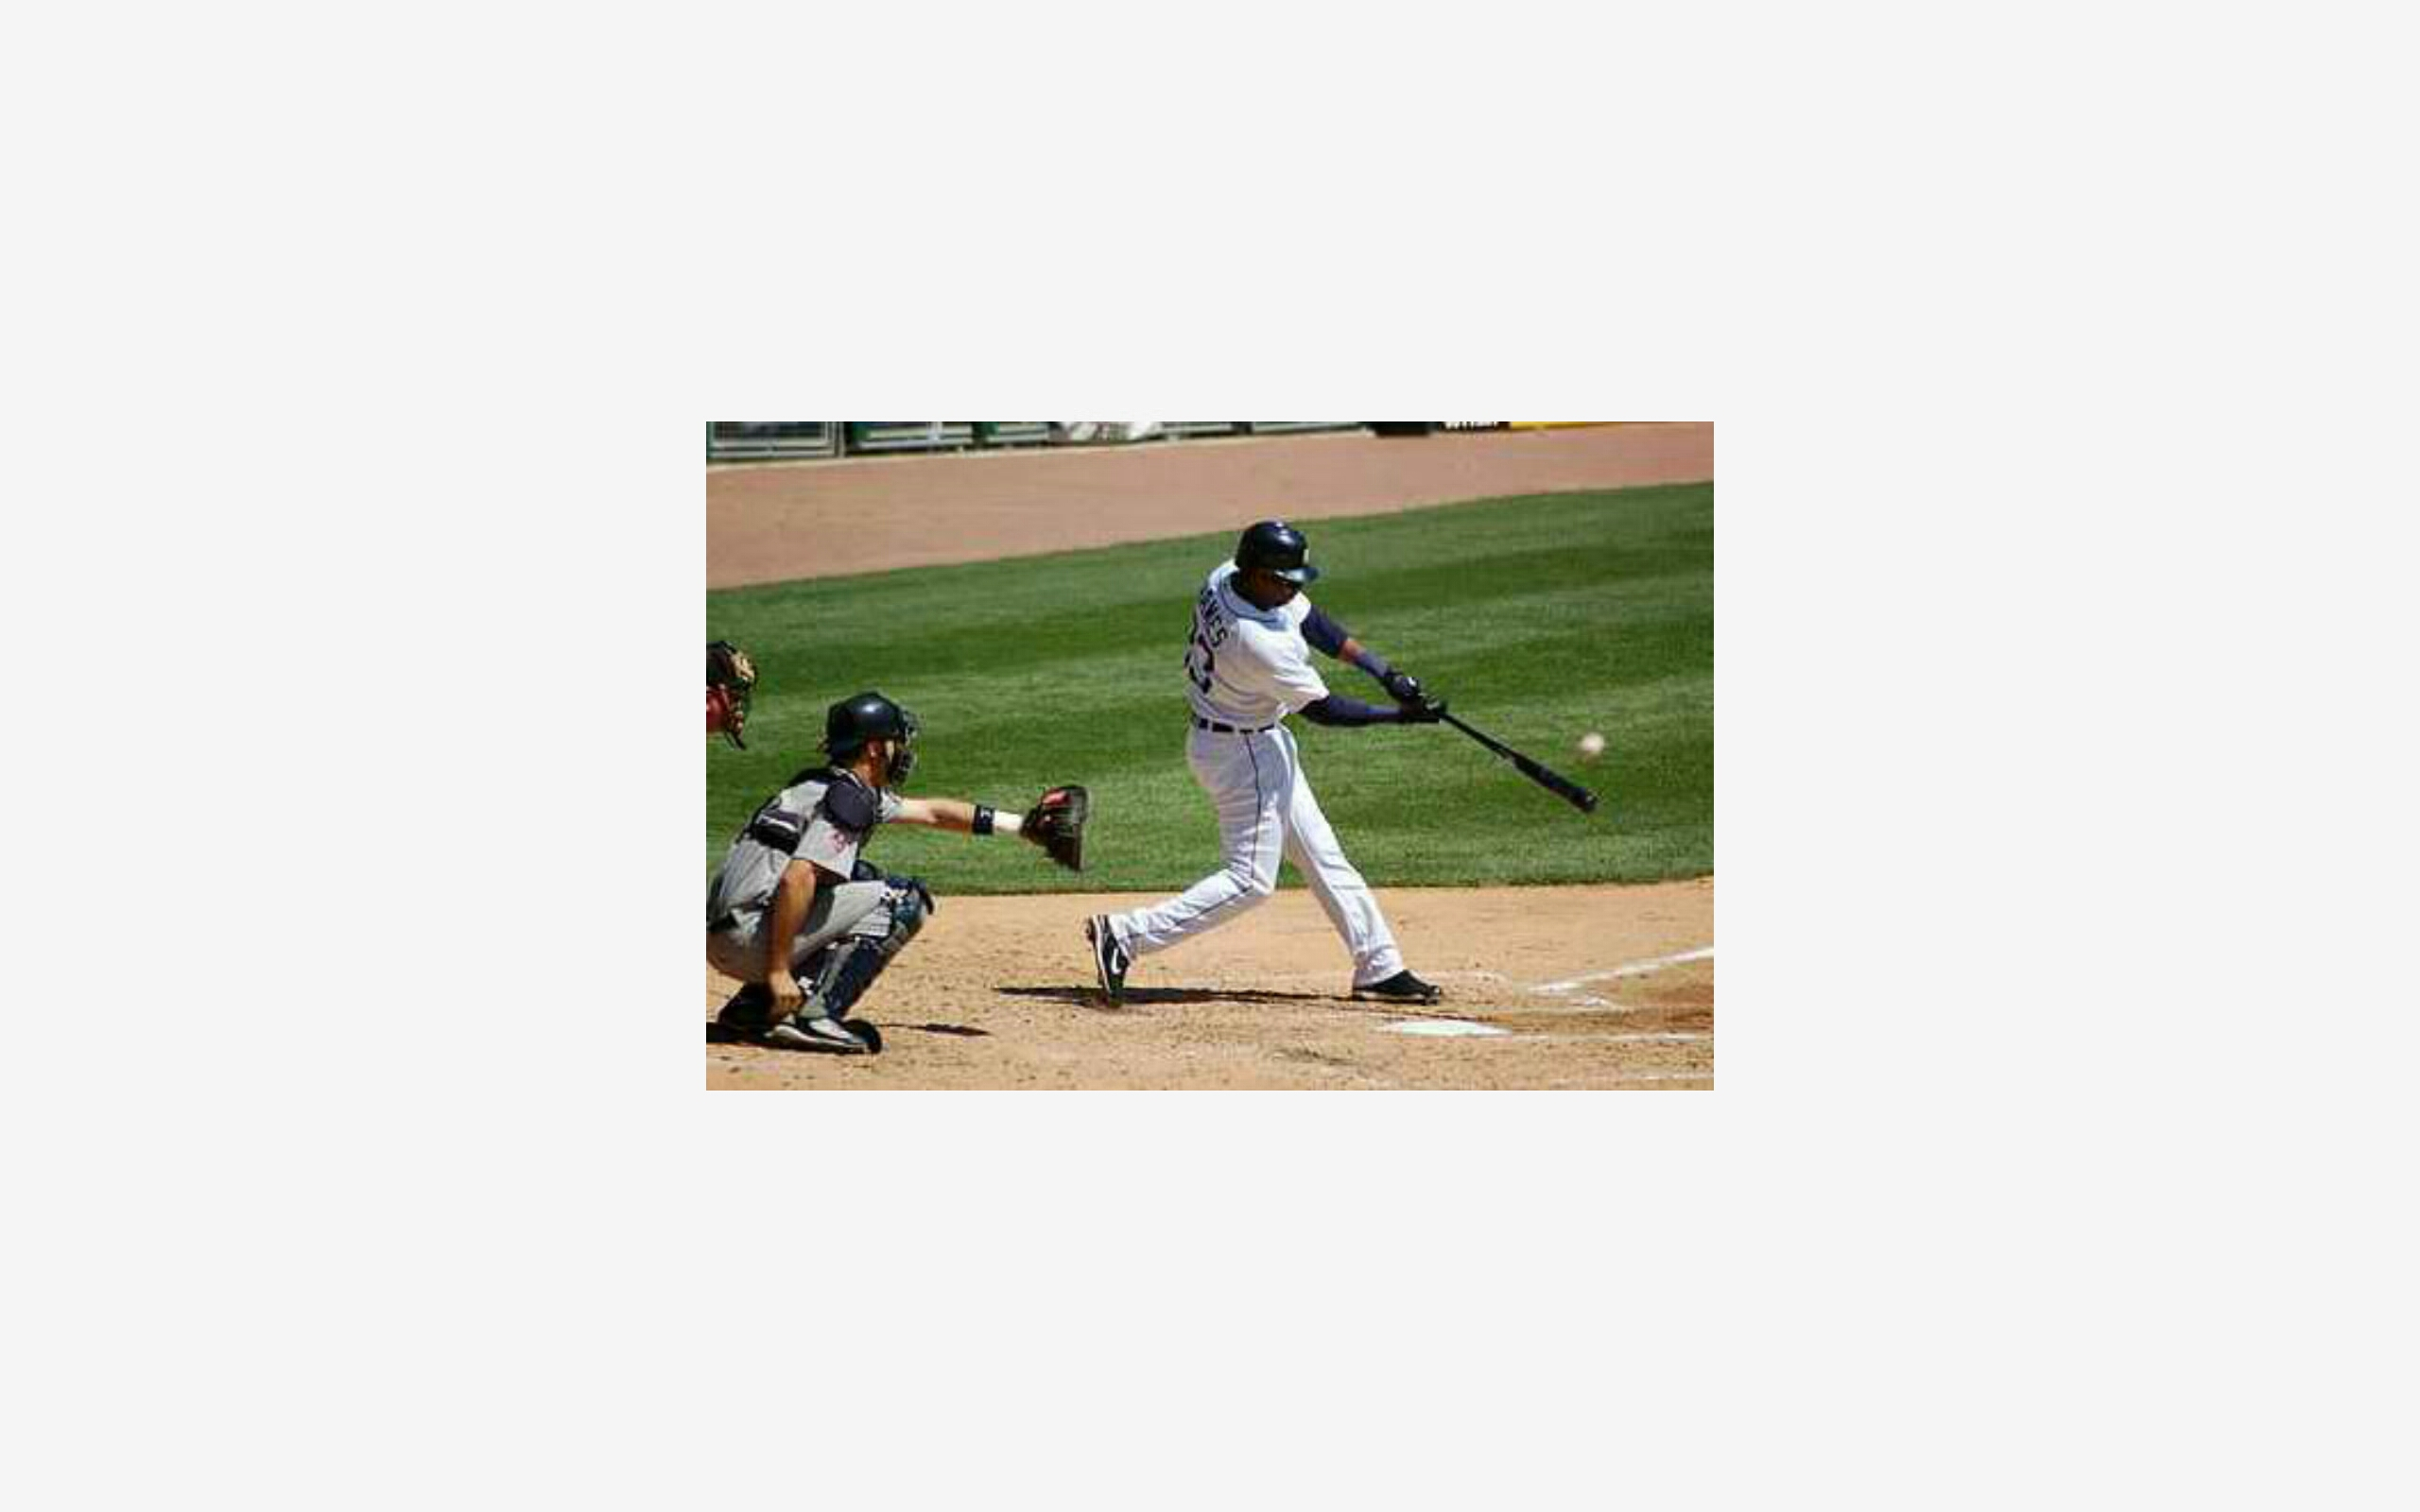 http://en.m.wikipedia.org/wiki/Batting_(baseball)